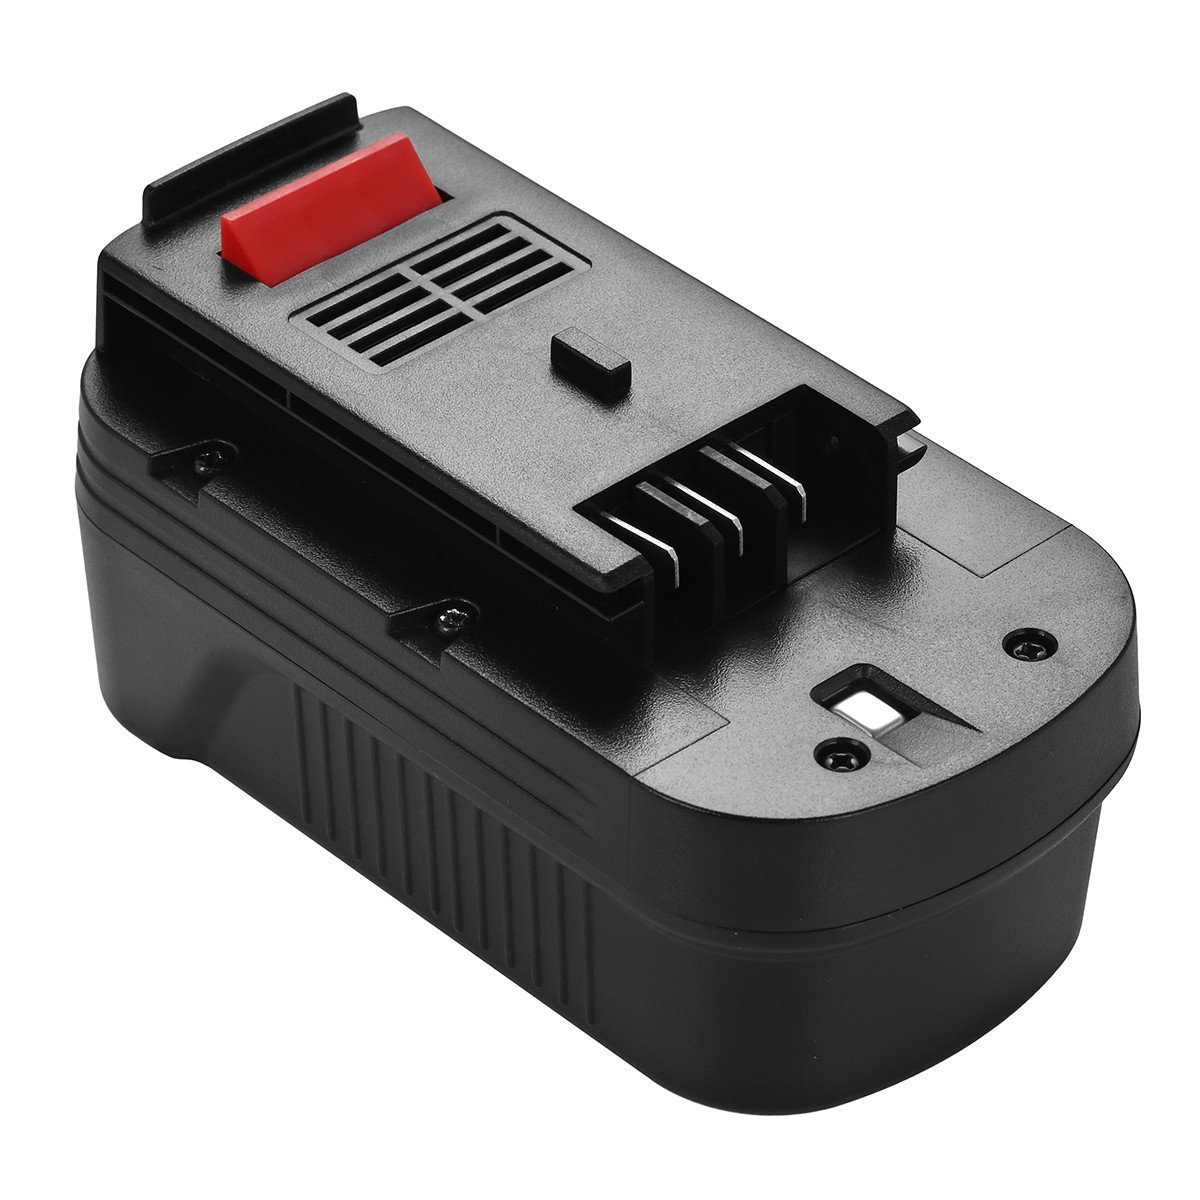 Powerextra Batteria per Black Decker 18V, Black and Decker [Ni-MH 3000mAh ] 244760-00 A1718 A18 A18E A18NH FIRESTORM A18 FSB18 HPB18 PS18K2 PS182KB NST2018 NST1810 NS118 NPT3118 NPP2018 NHT518 - Nero